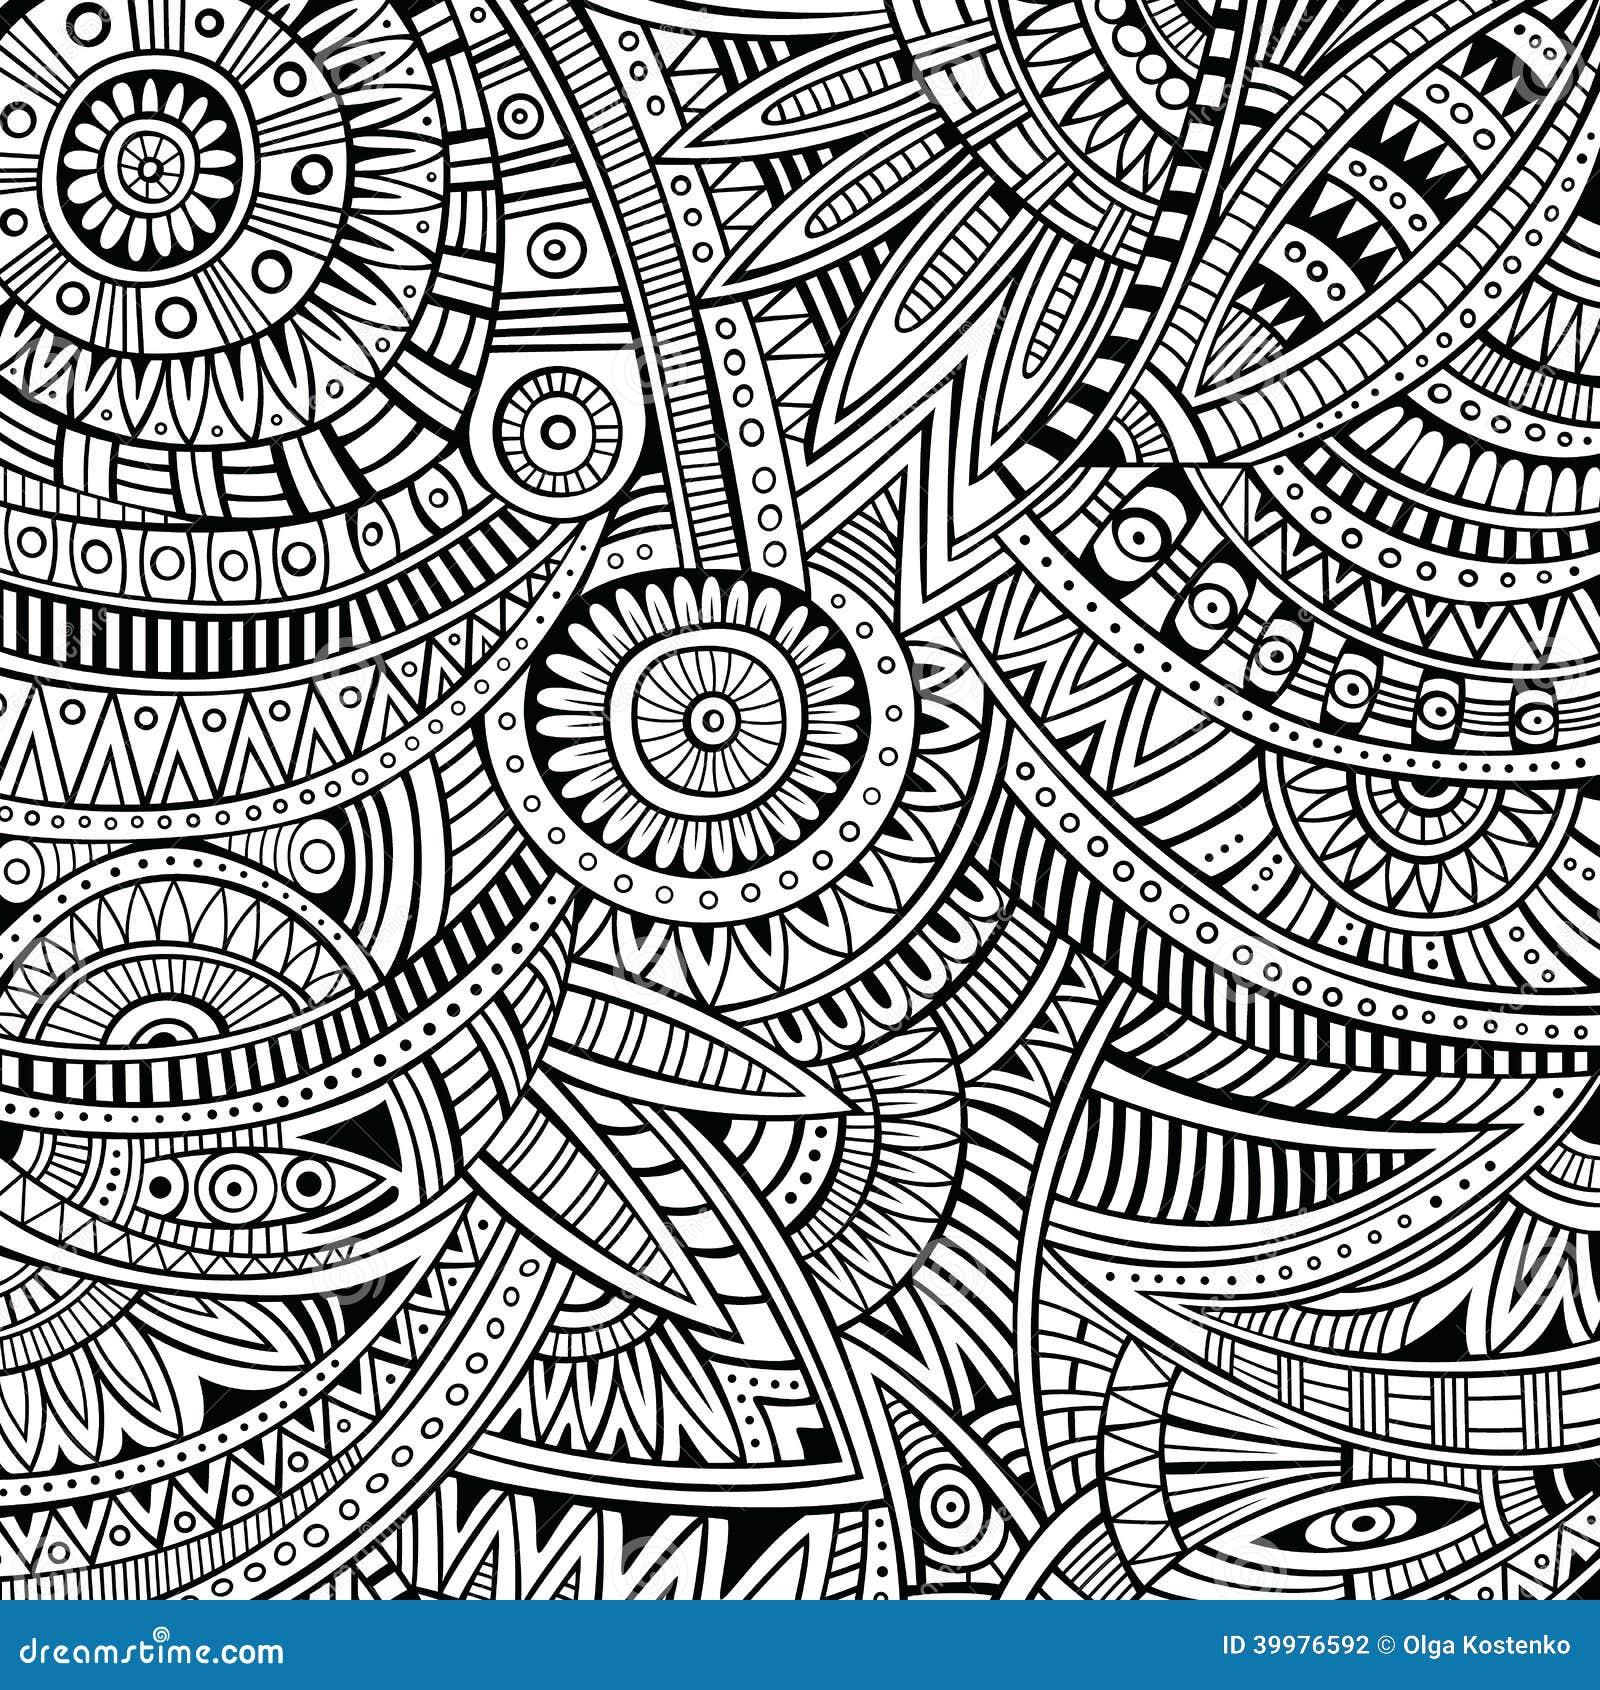 Abstract vector stammen etnisch patroon als achtergrond